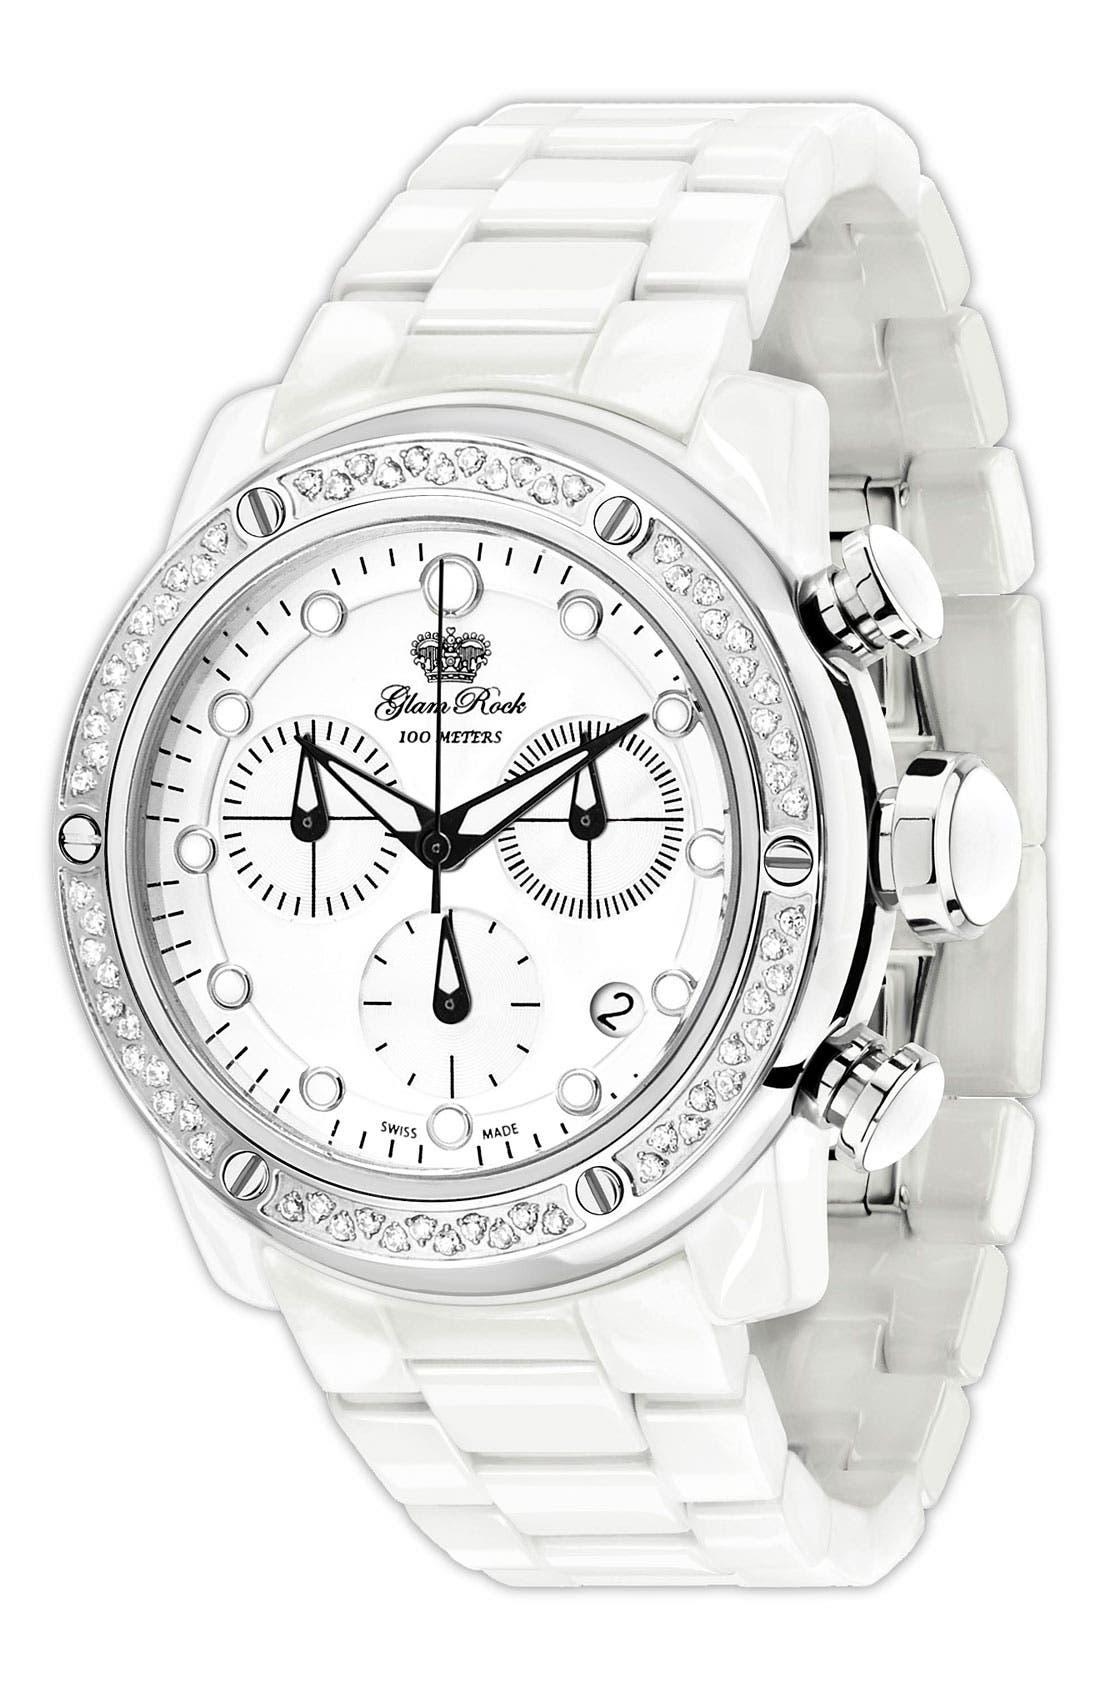 Main Image - Glam Rock 'Aqua Rock' Diamond & Ceramic Bracelet Watch